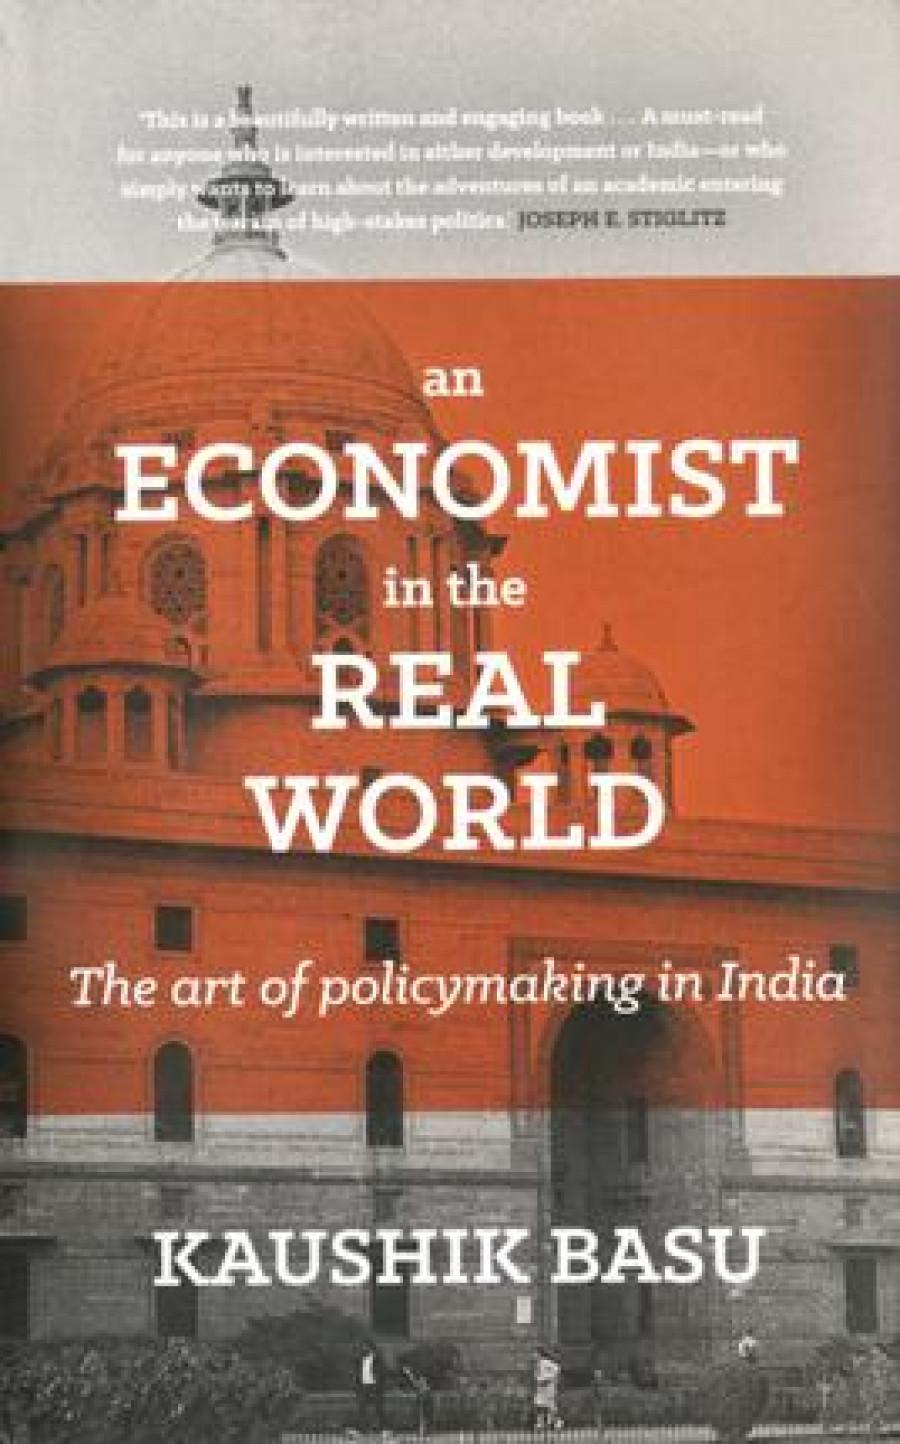 पुस्तक - नामी अर्थशास्त्रीको प्रेस्क्रिप्सन